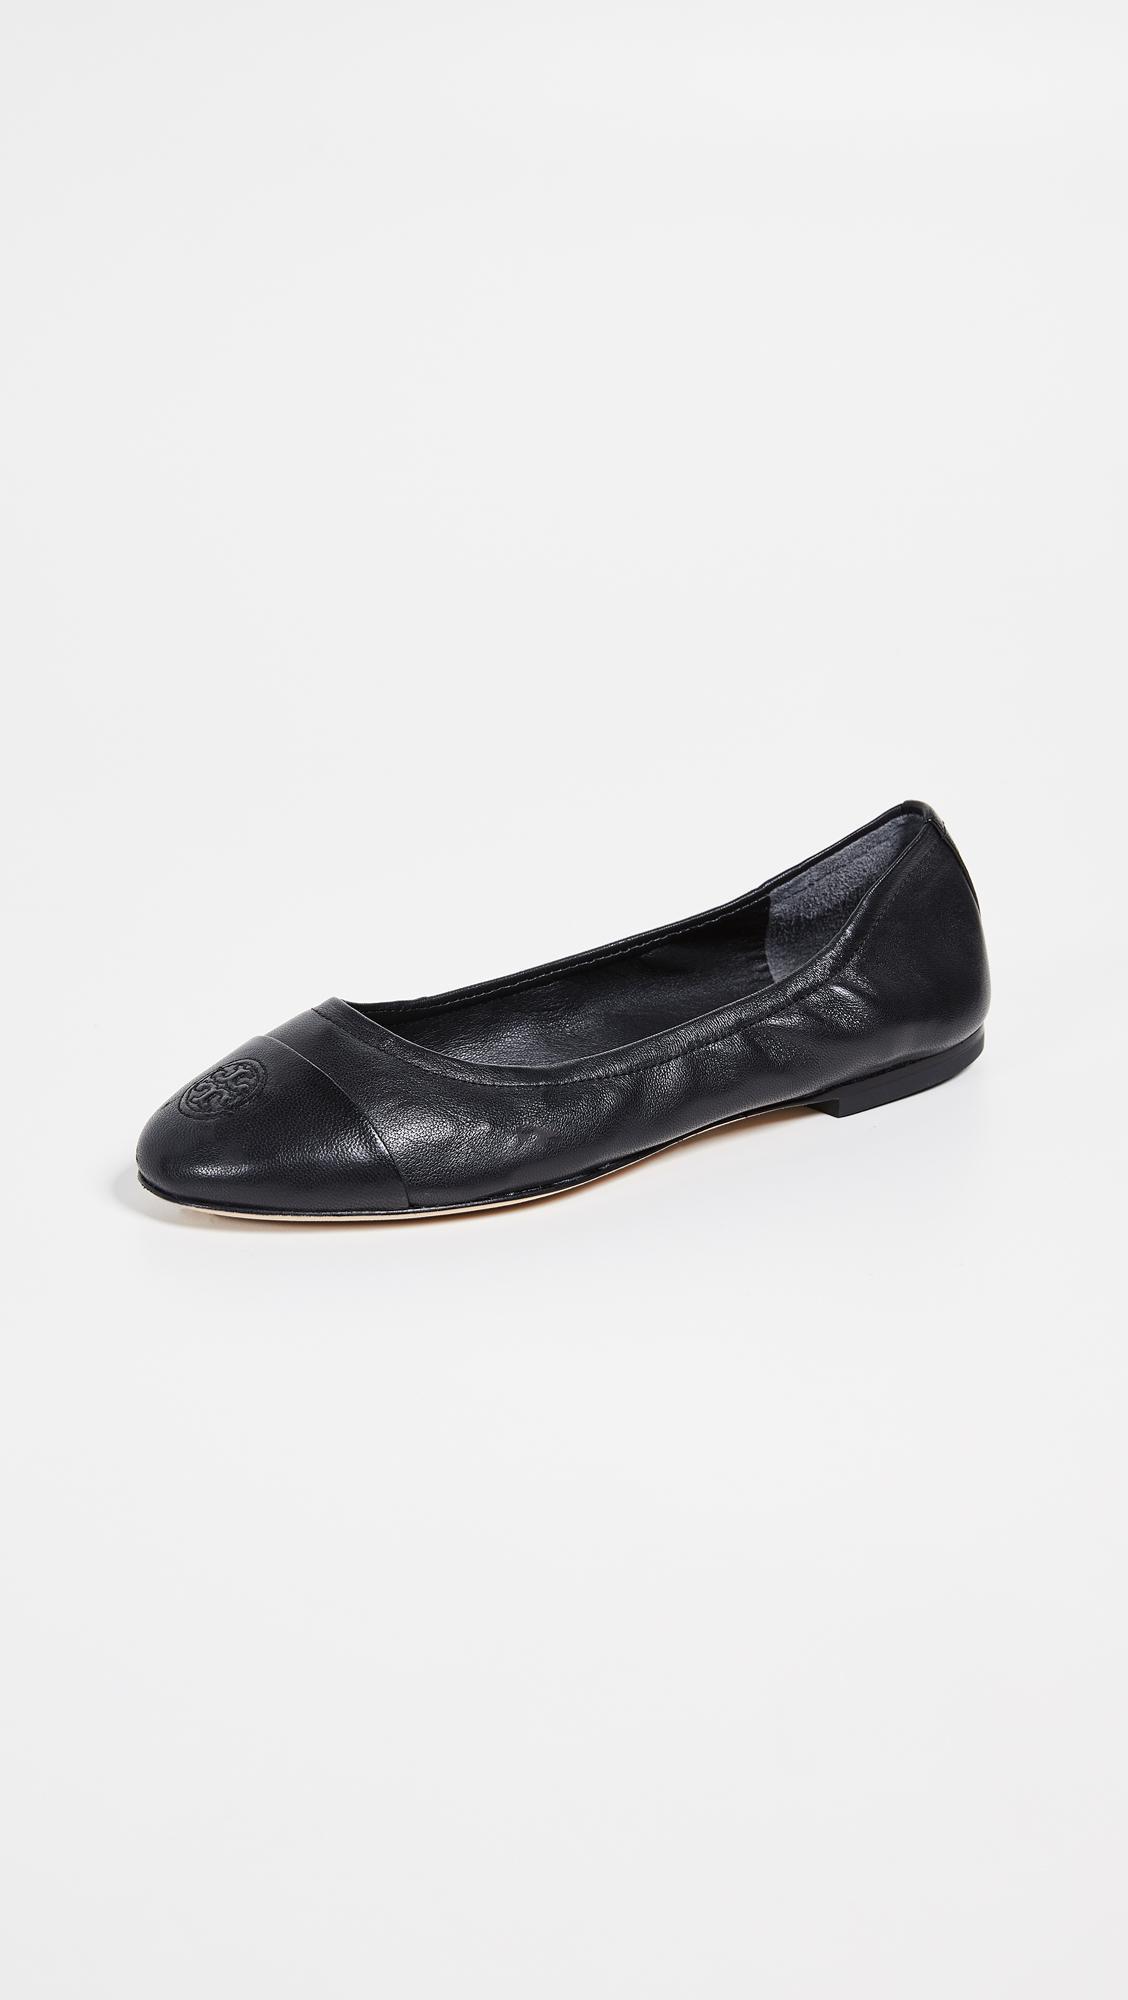 5c281274b Lyst - Tory Burch Cap Toe Ballet Flats in Black